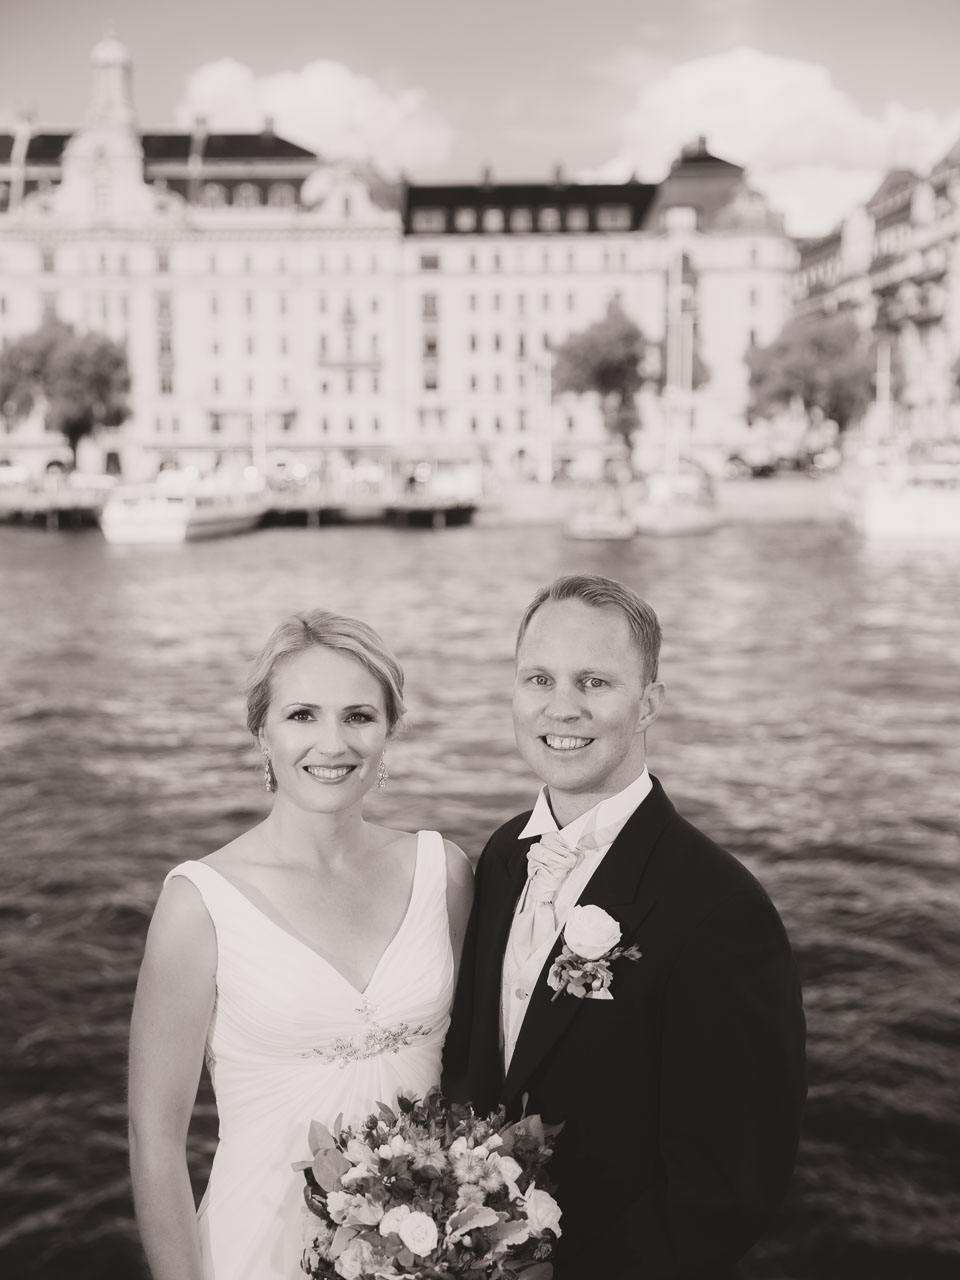 106687ee7587 brollopsfotograf-stockholm-nybrokajen-wedding-photographer-sweden-8 ...